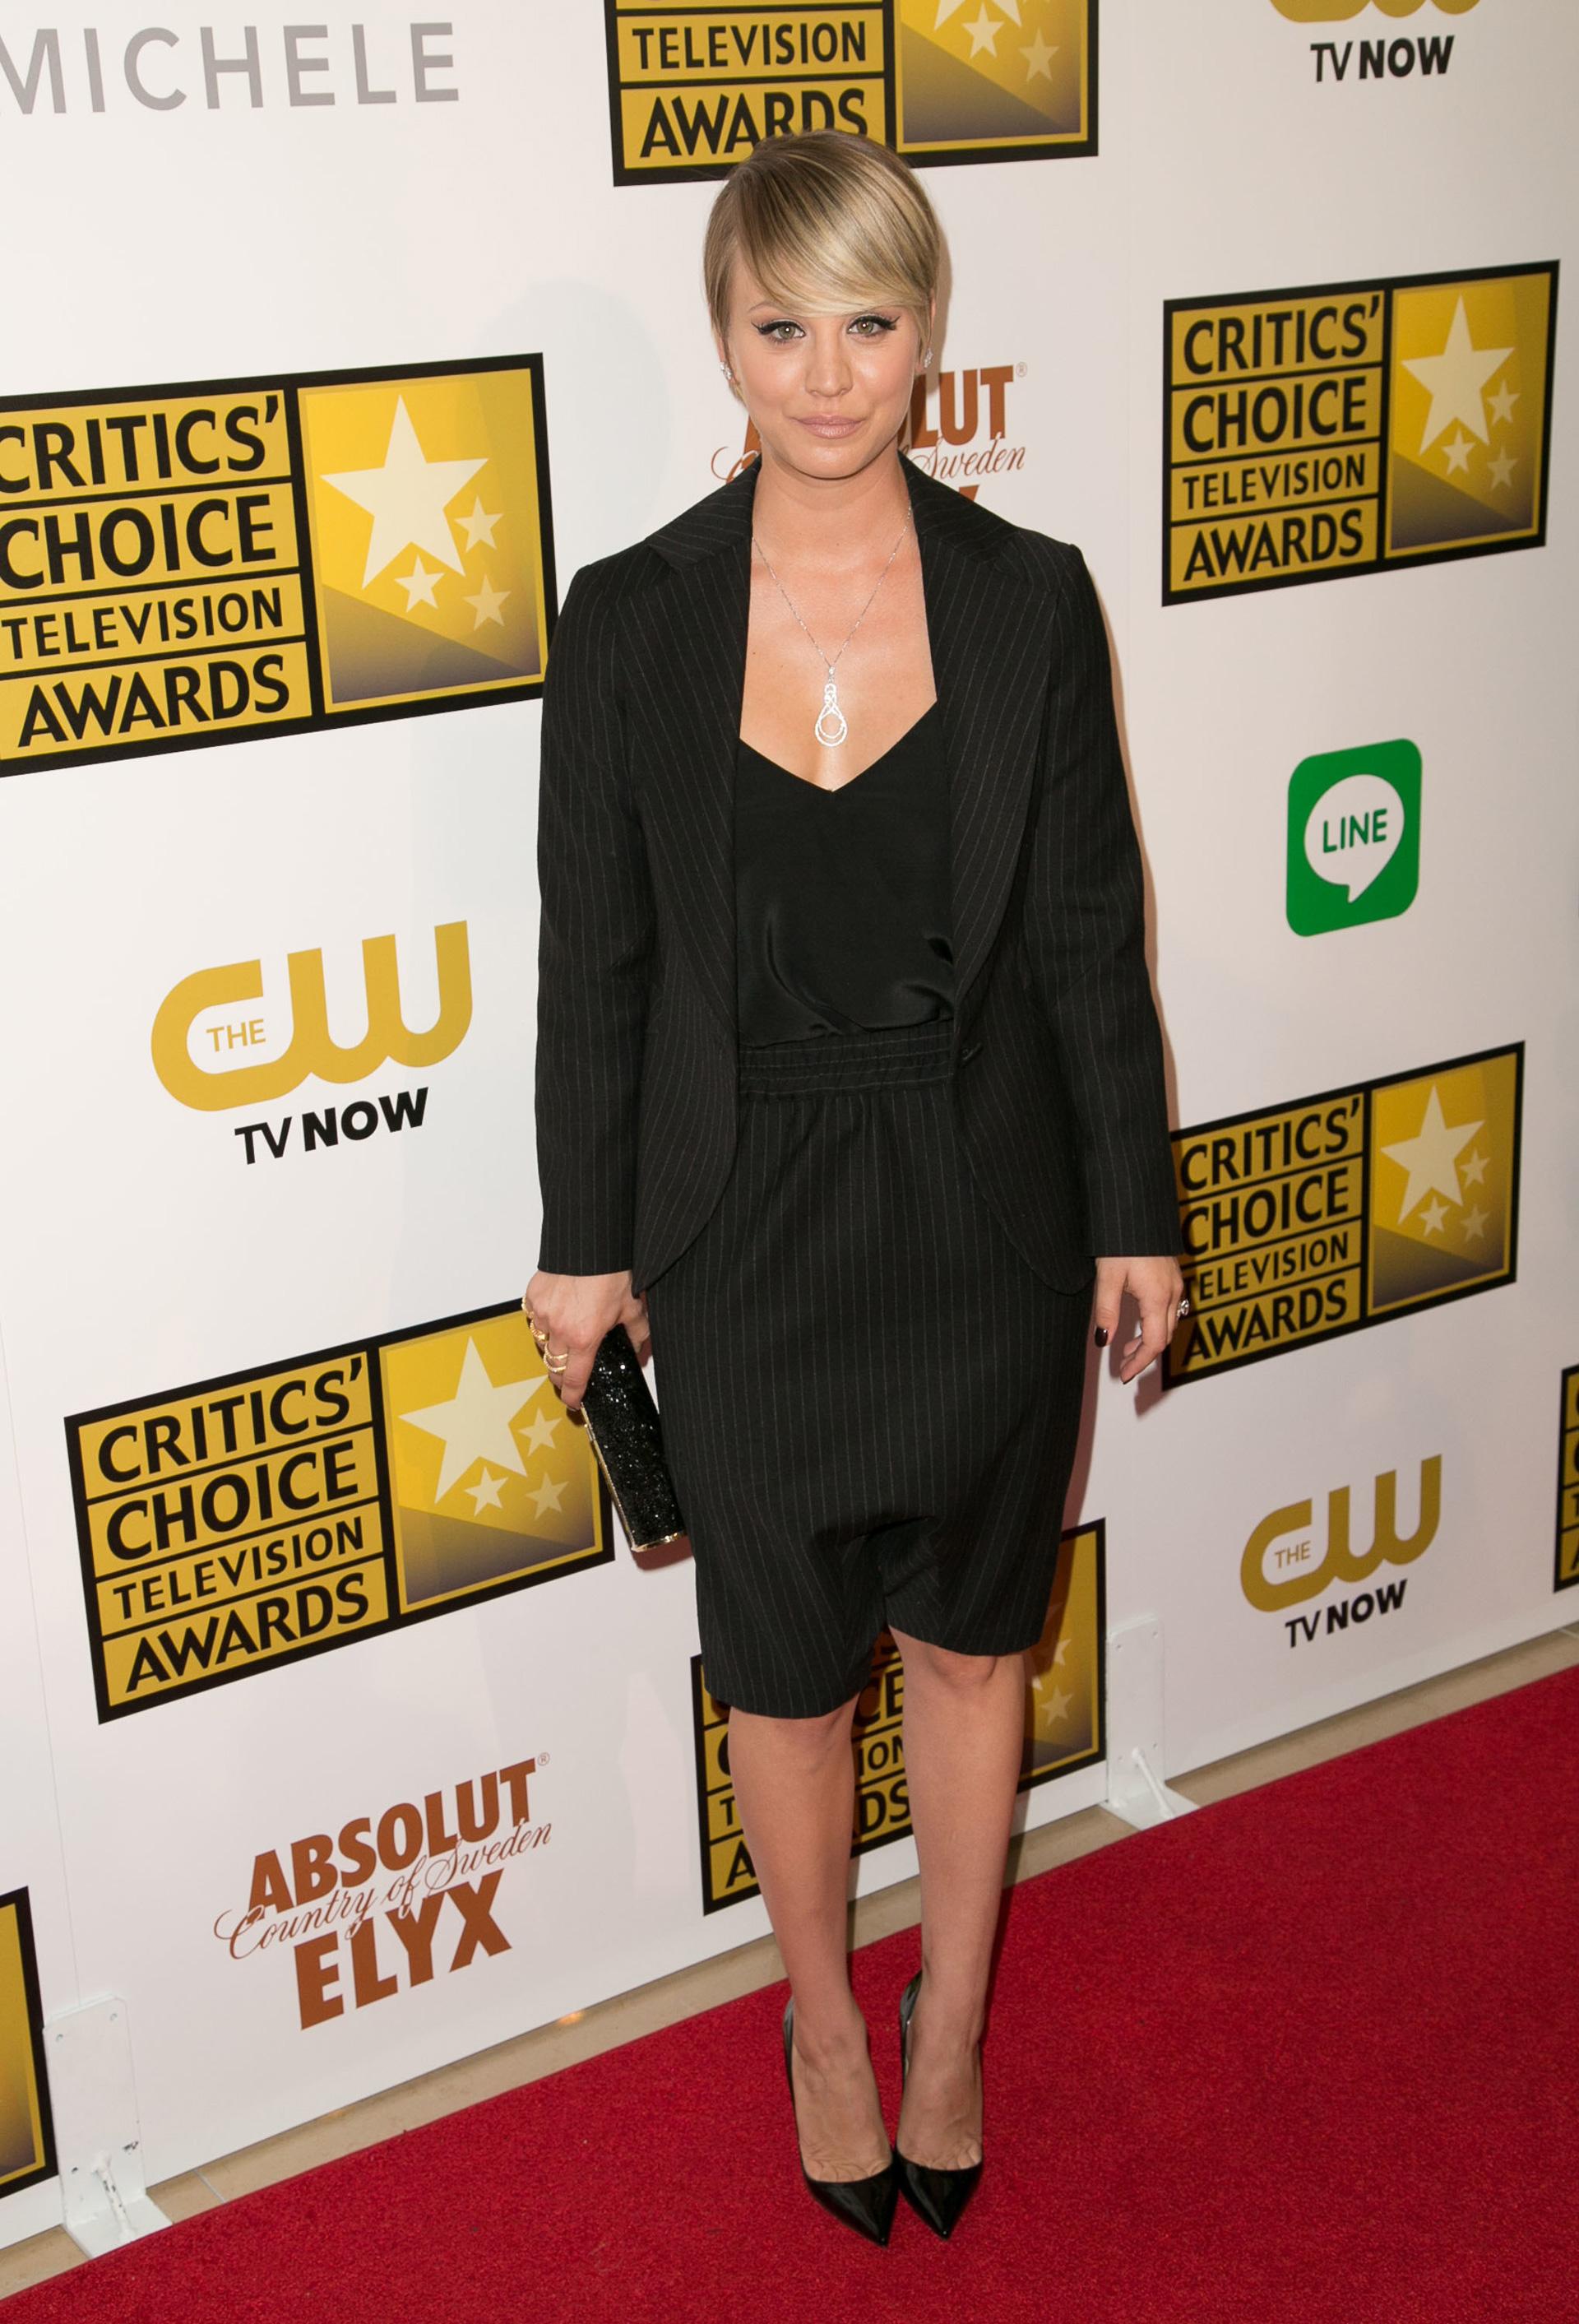 Kaley Cuoco at the Critic's Choice Awards